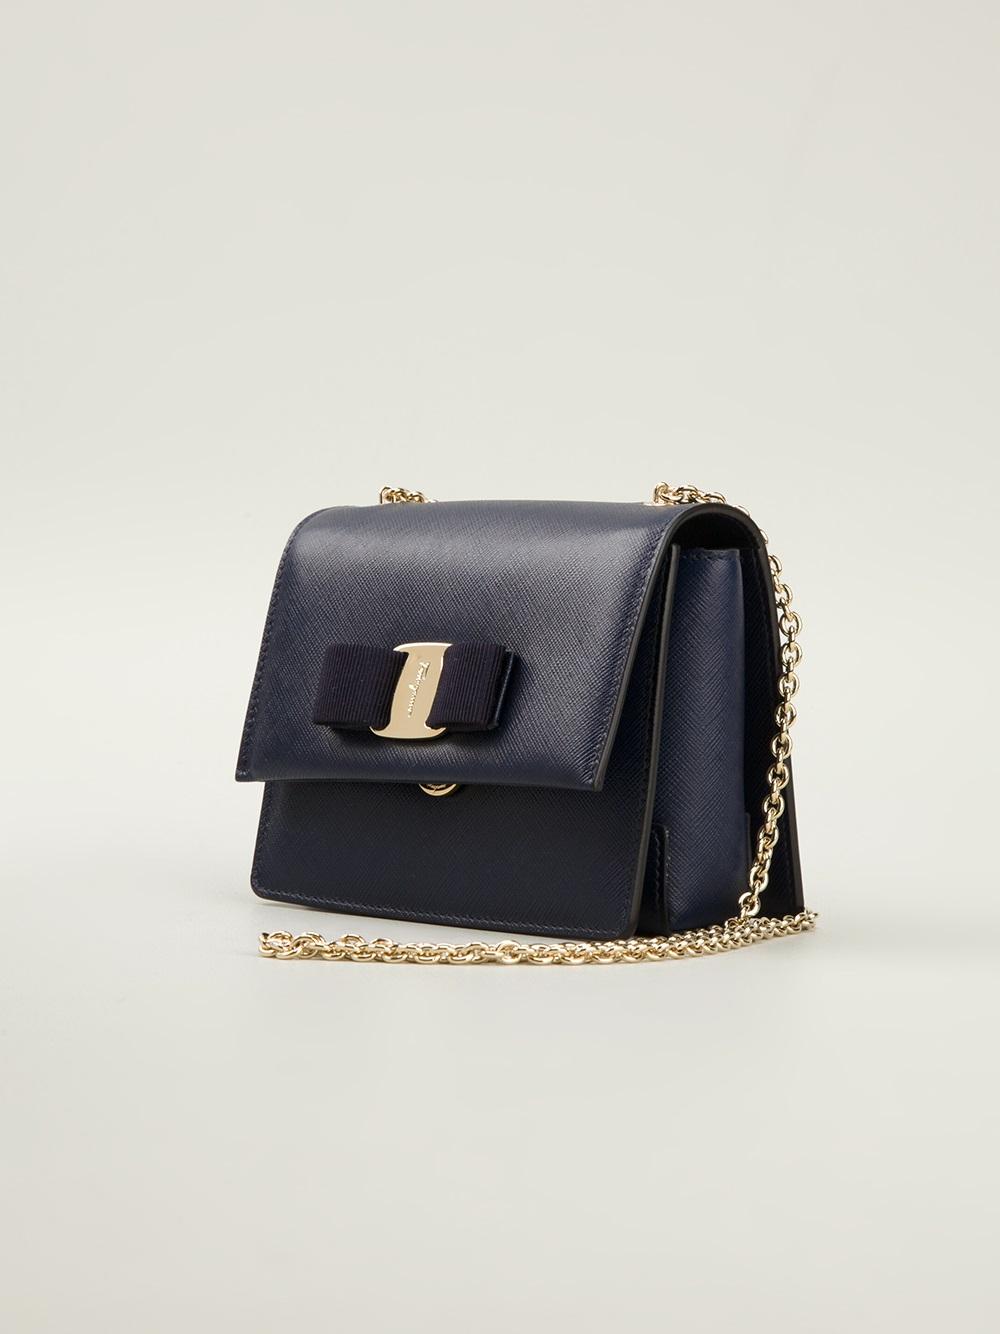 Lyst - Ferragamo Ginny Crossbody Bag in Blue f84e54e51d